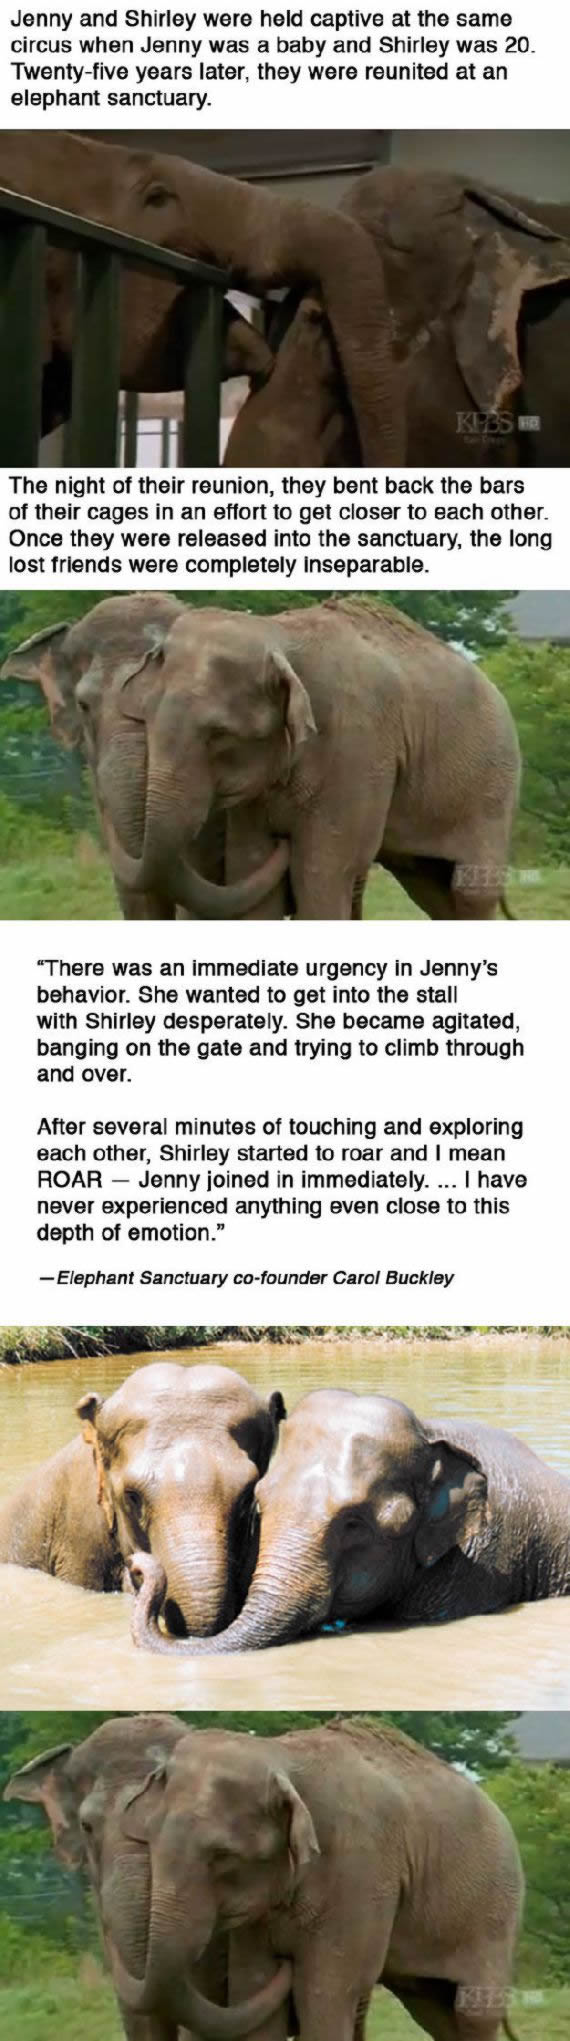 elefantes Jenny y Shirley